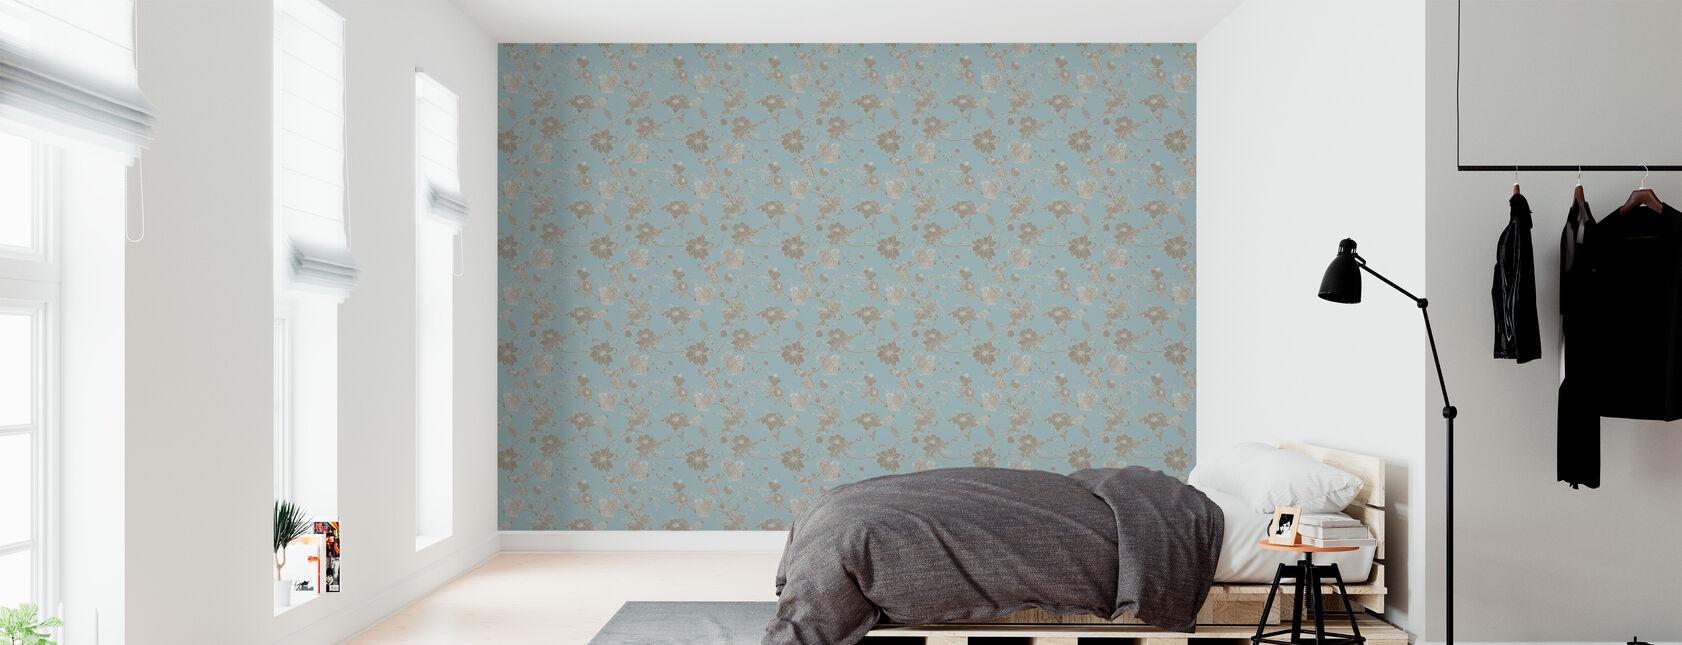 Botanica - Turquoise - Tapet - Soverom